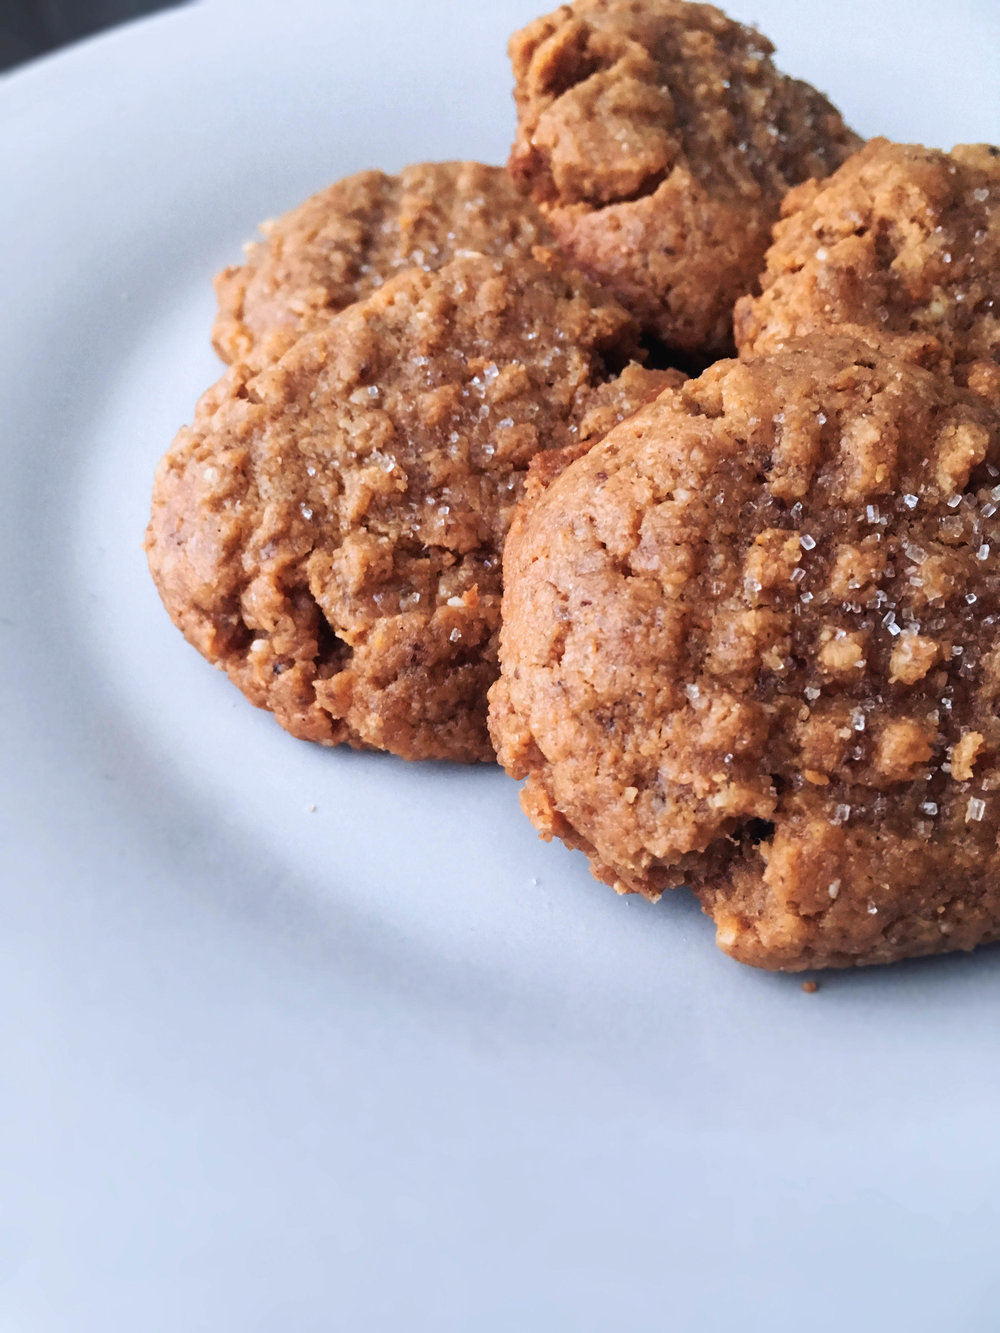 vegan-gluten-free-peanut-butter-cookies.jpg